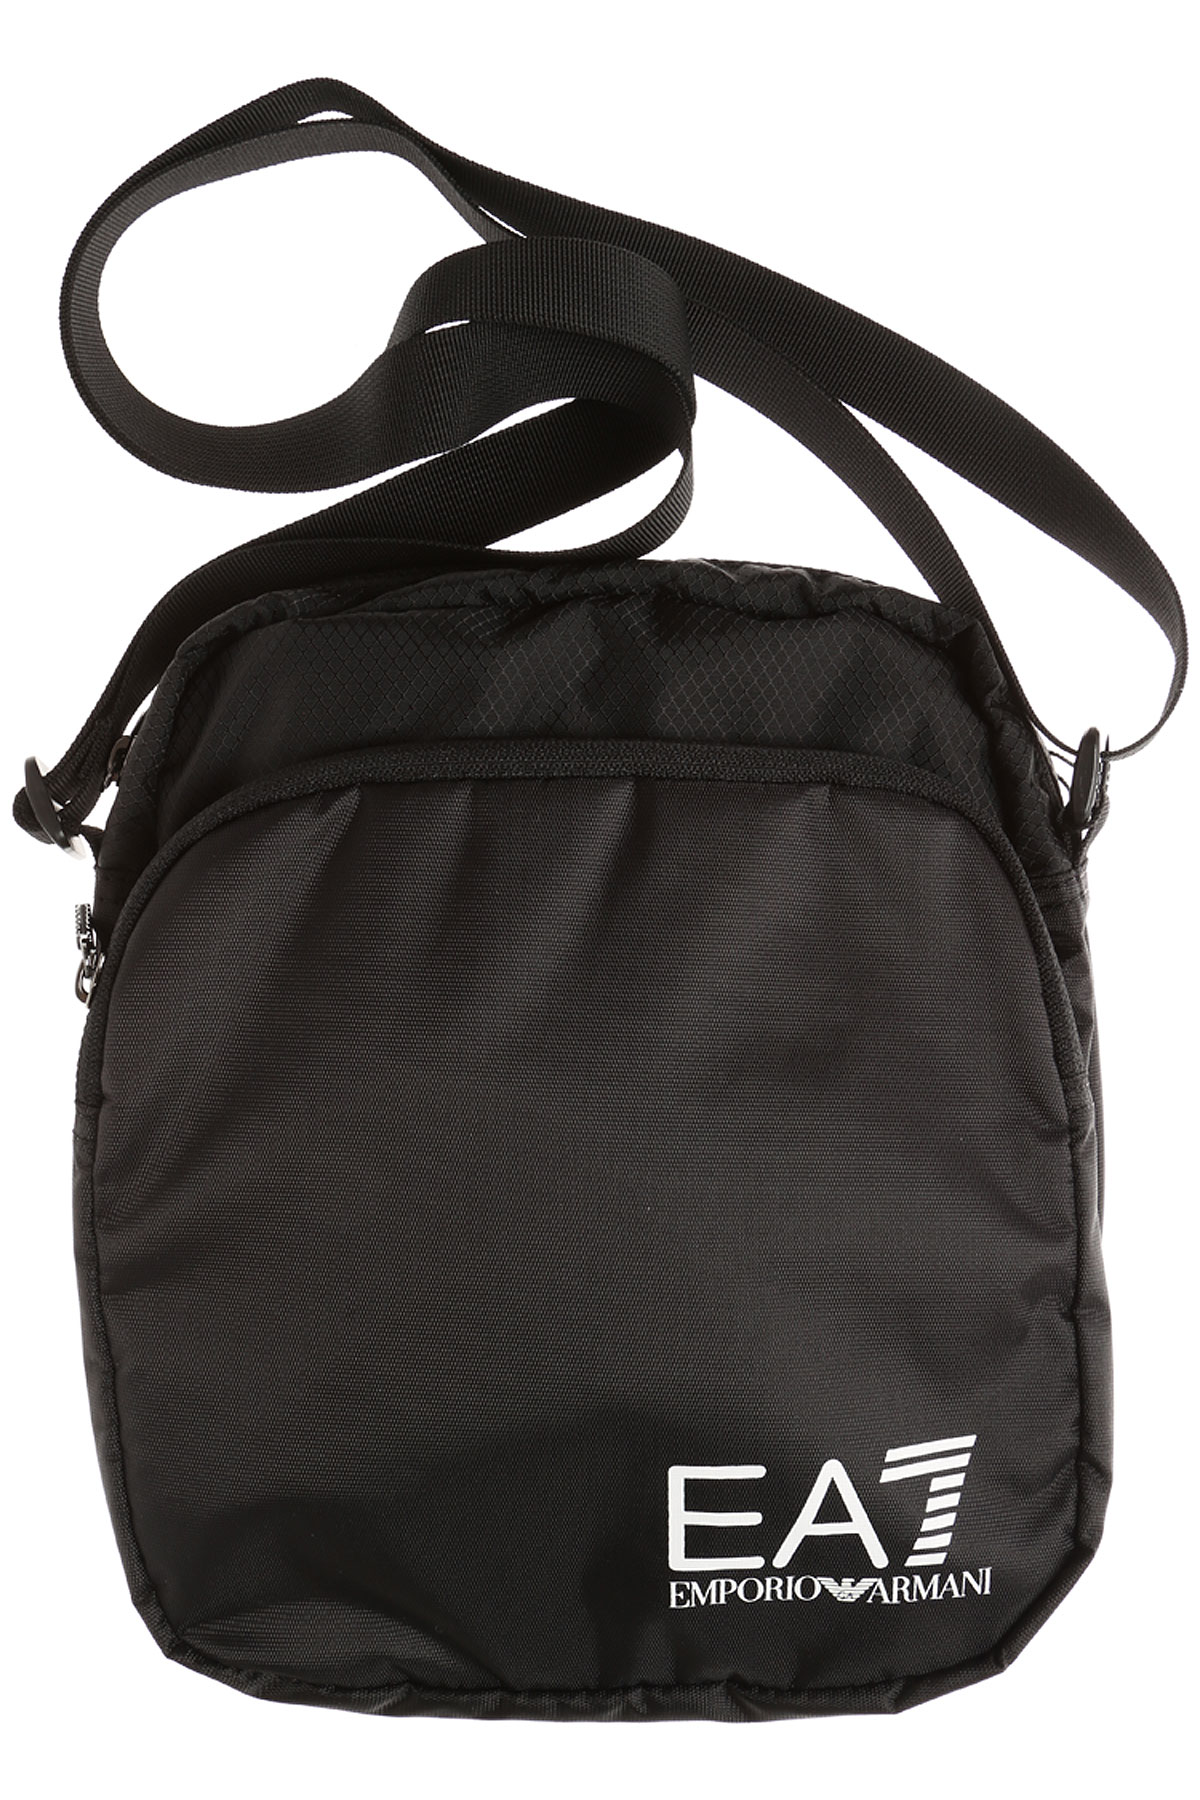 Image of Emporio Armani Messenger Bag for Men, Train Prime Pouch, Black, polyamide, 2017